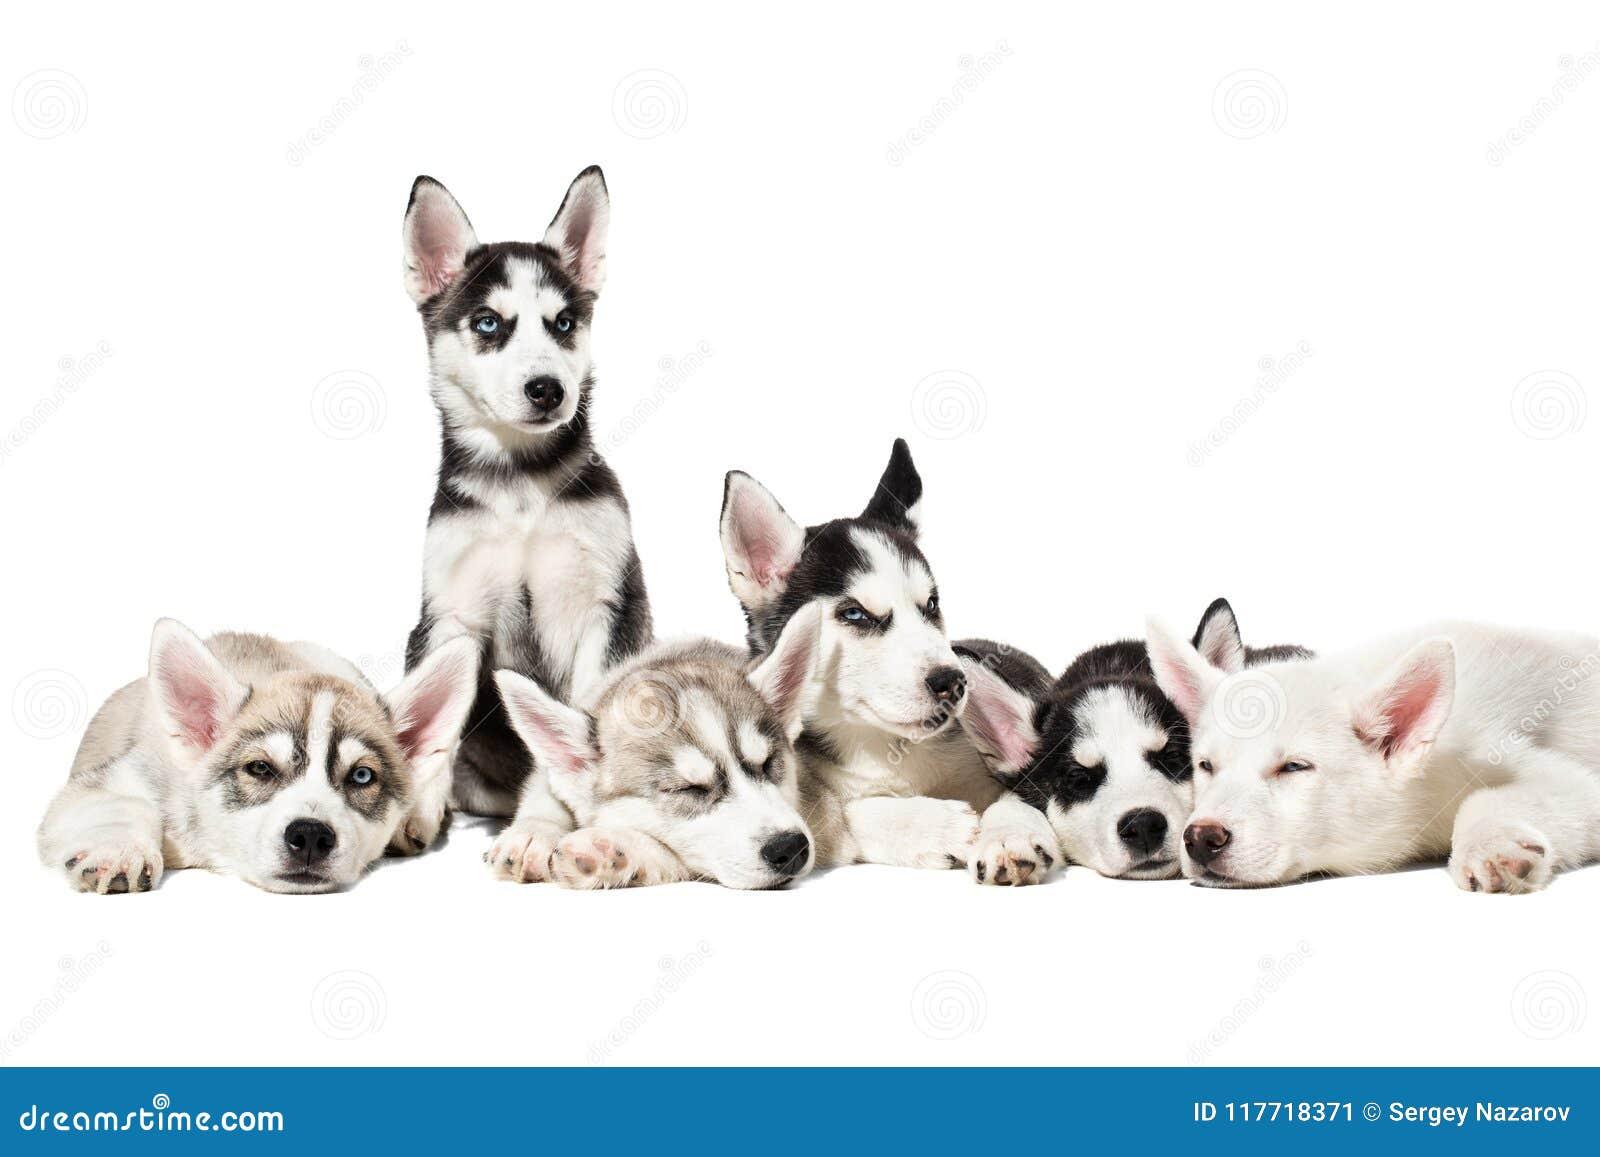 Cute Siberian Husky Puppies On White Background Stock Image Image Of Baby Eyes 117718371